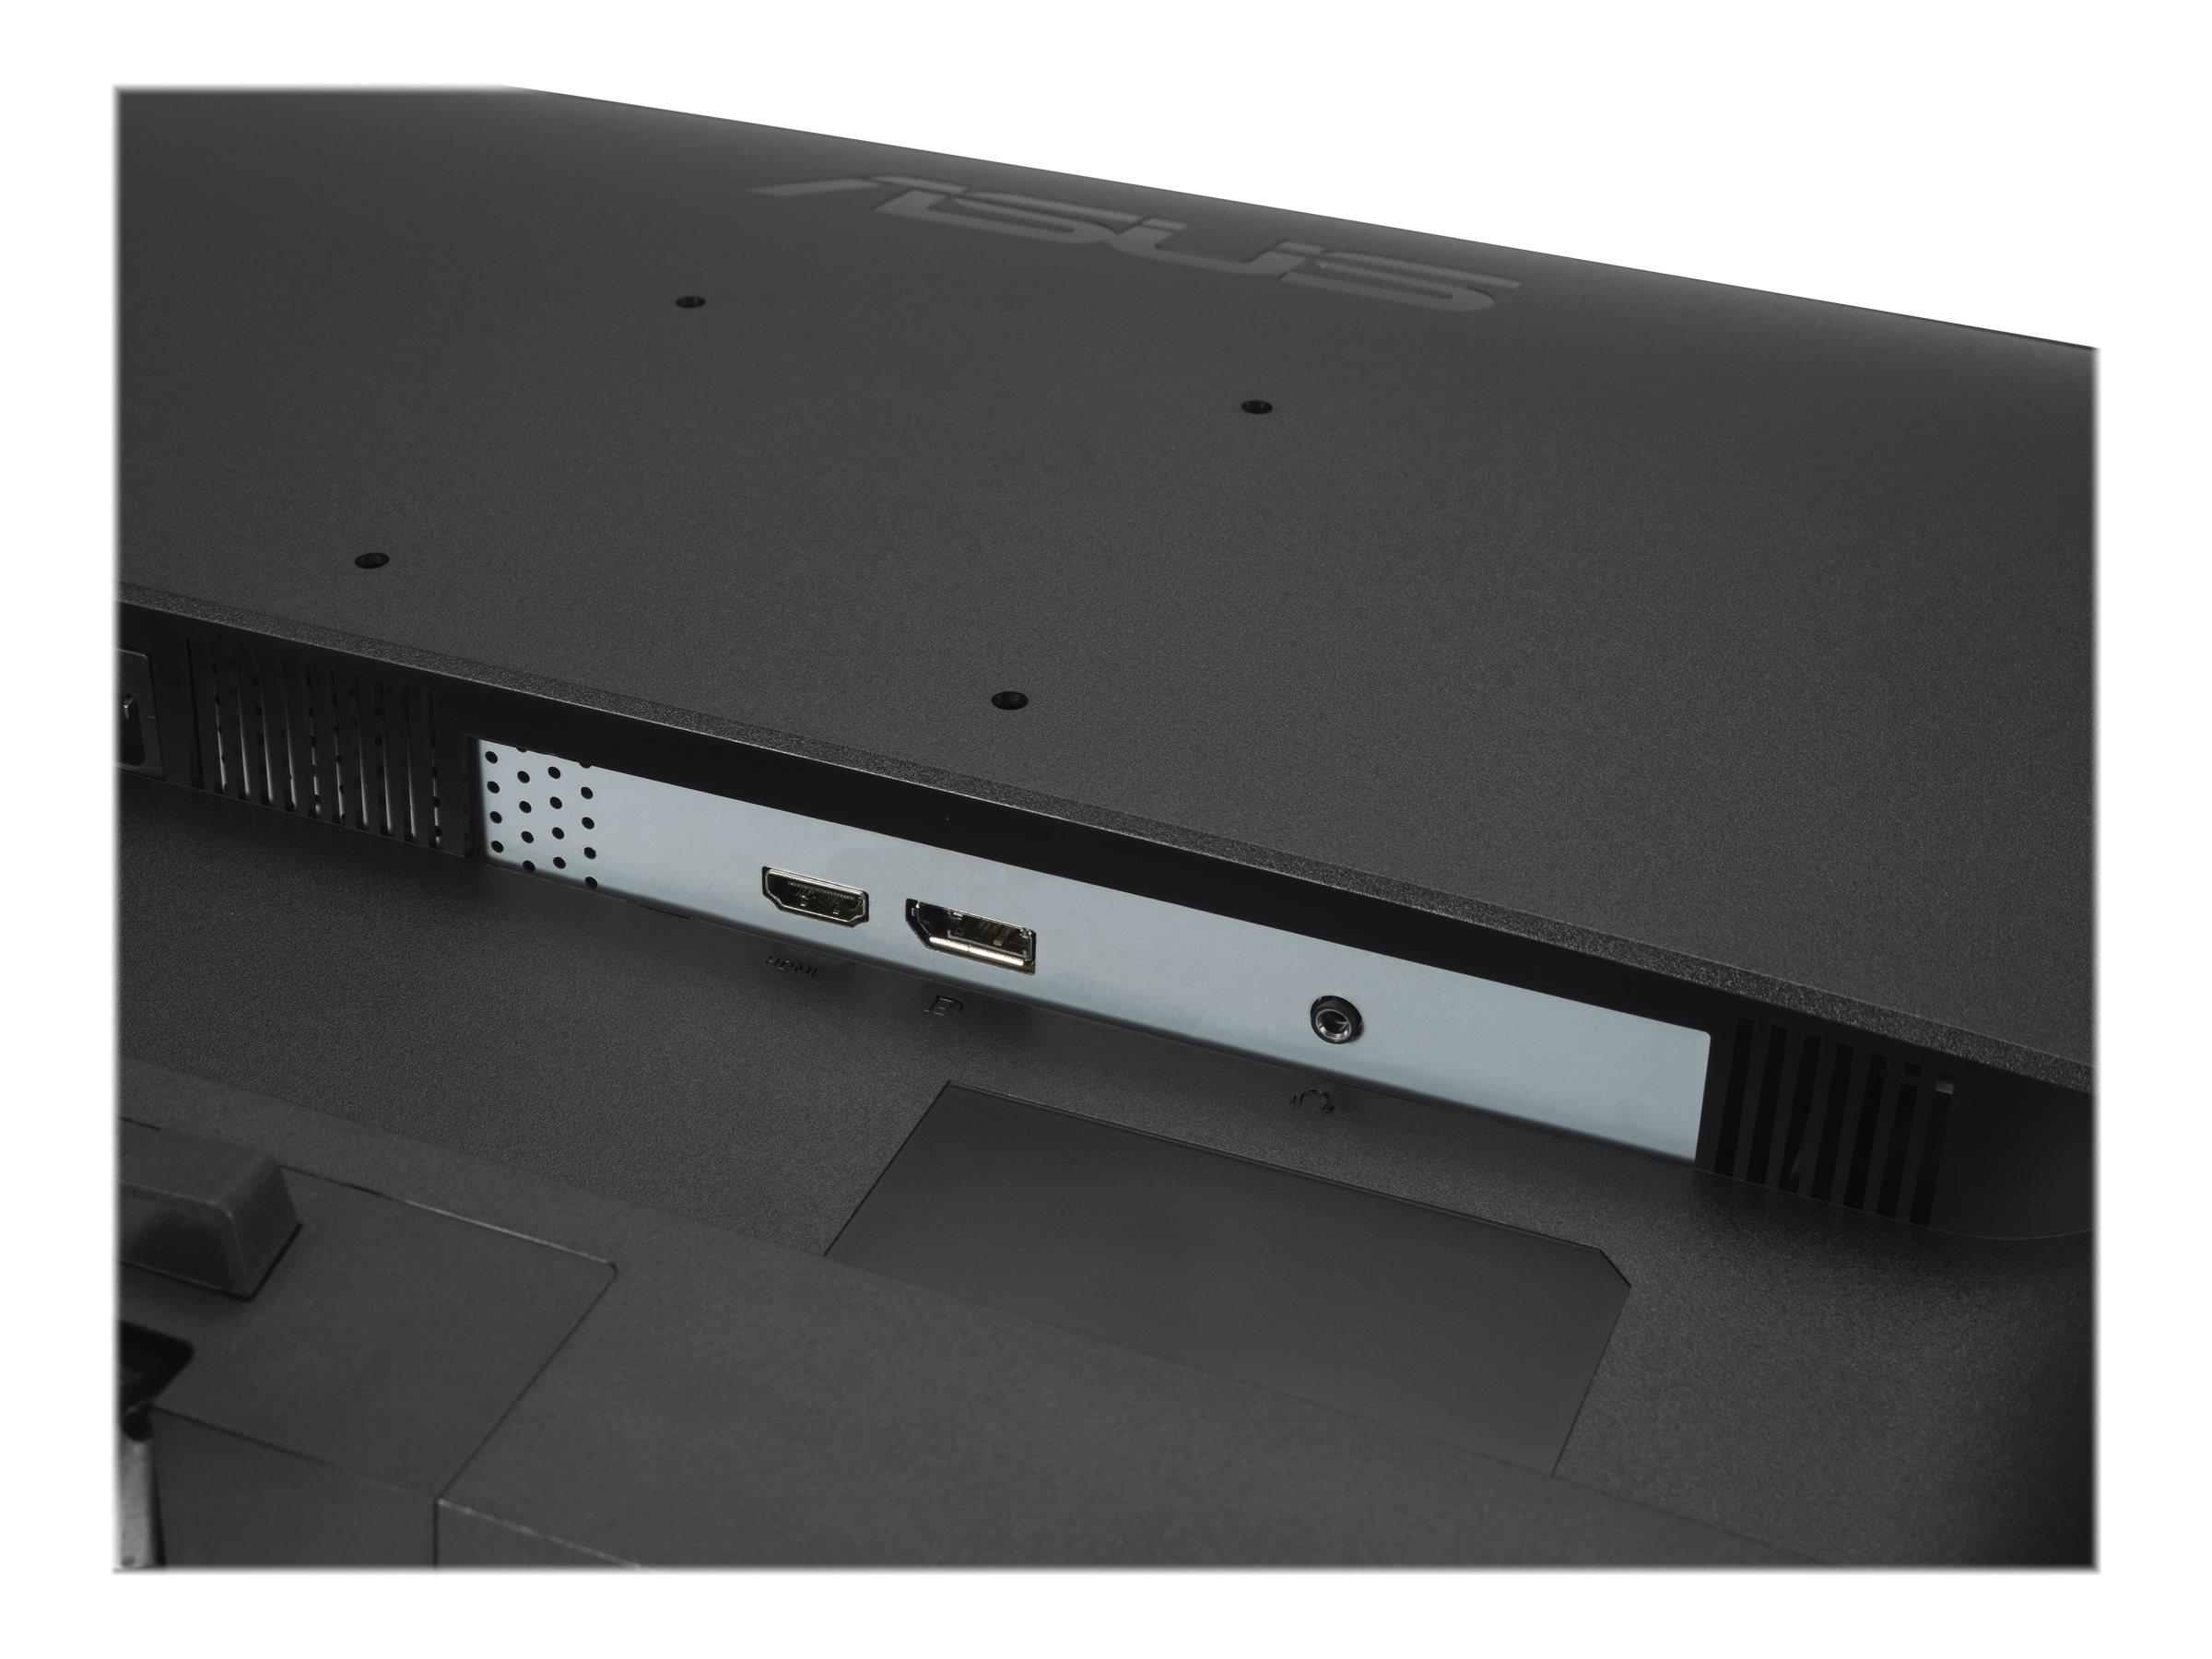 "ASUS VP32AQ - LED-Monitor - 80 cm (31.5"") - 2560 x 1440 WQHD @ 75 Hz"